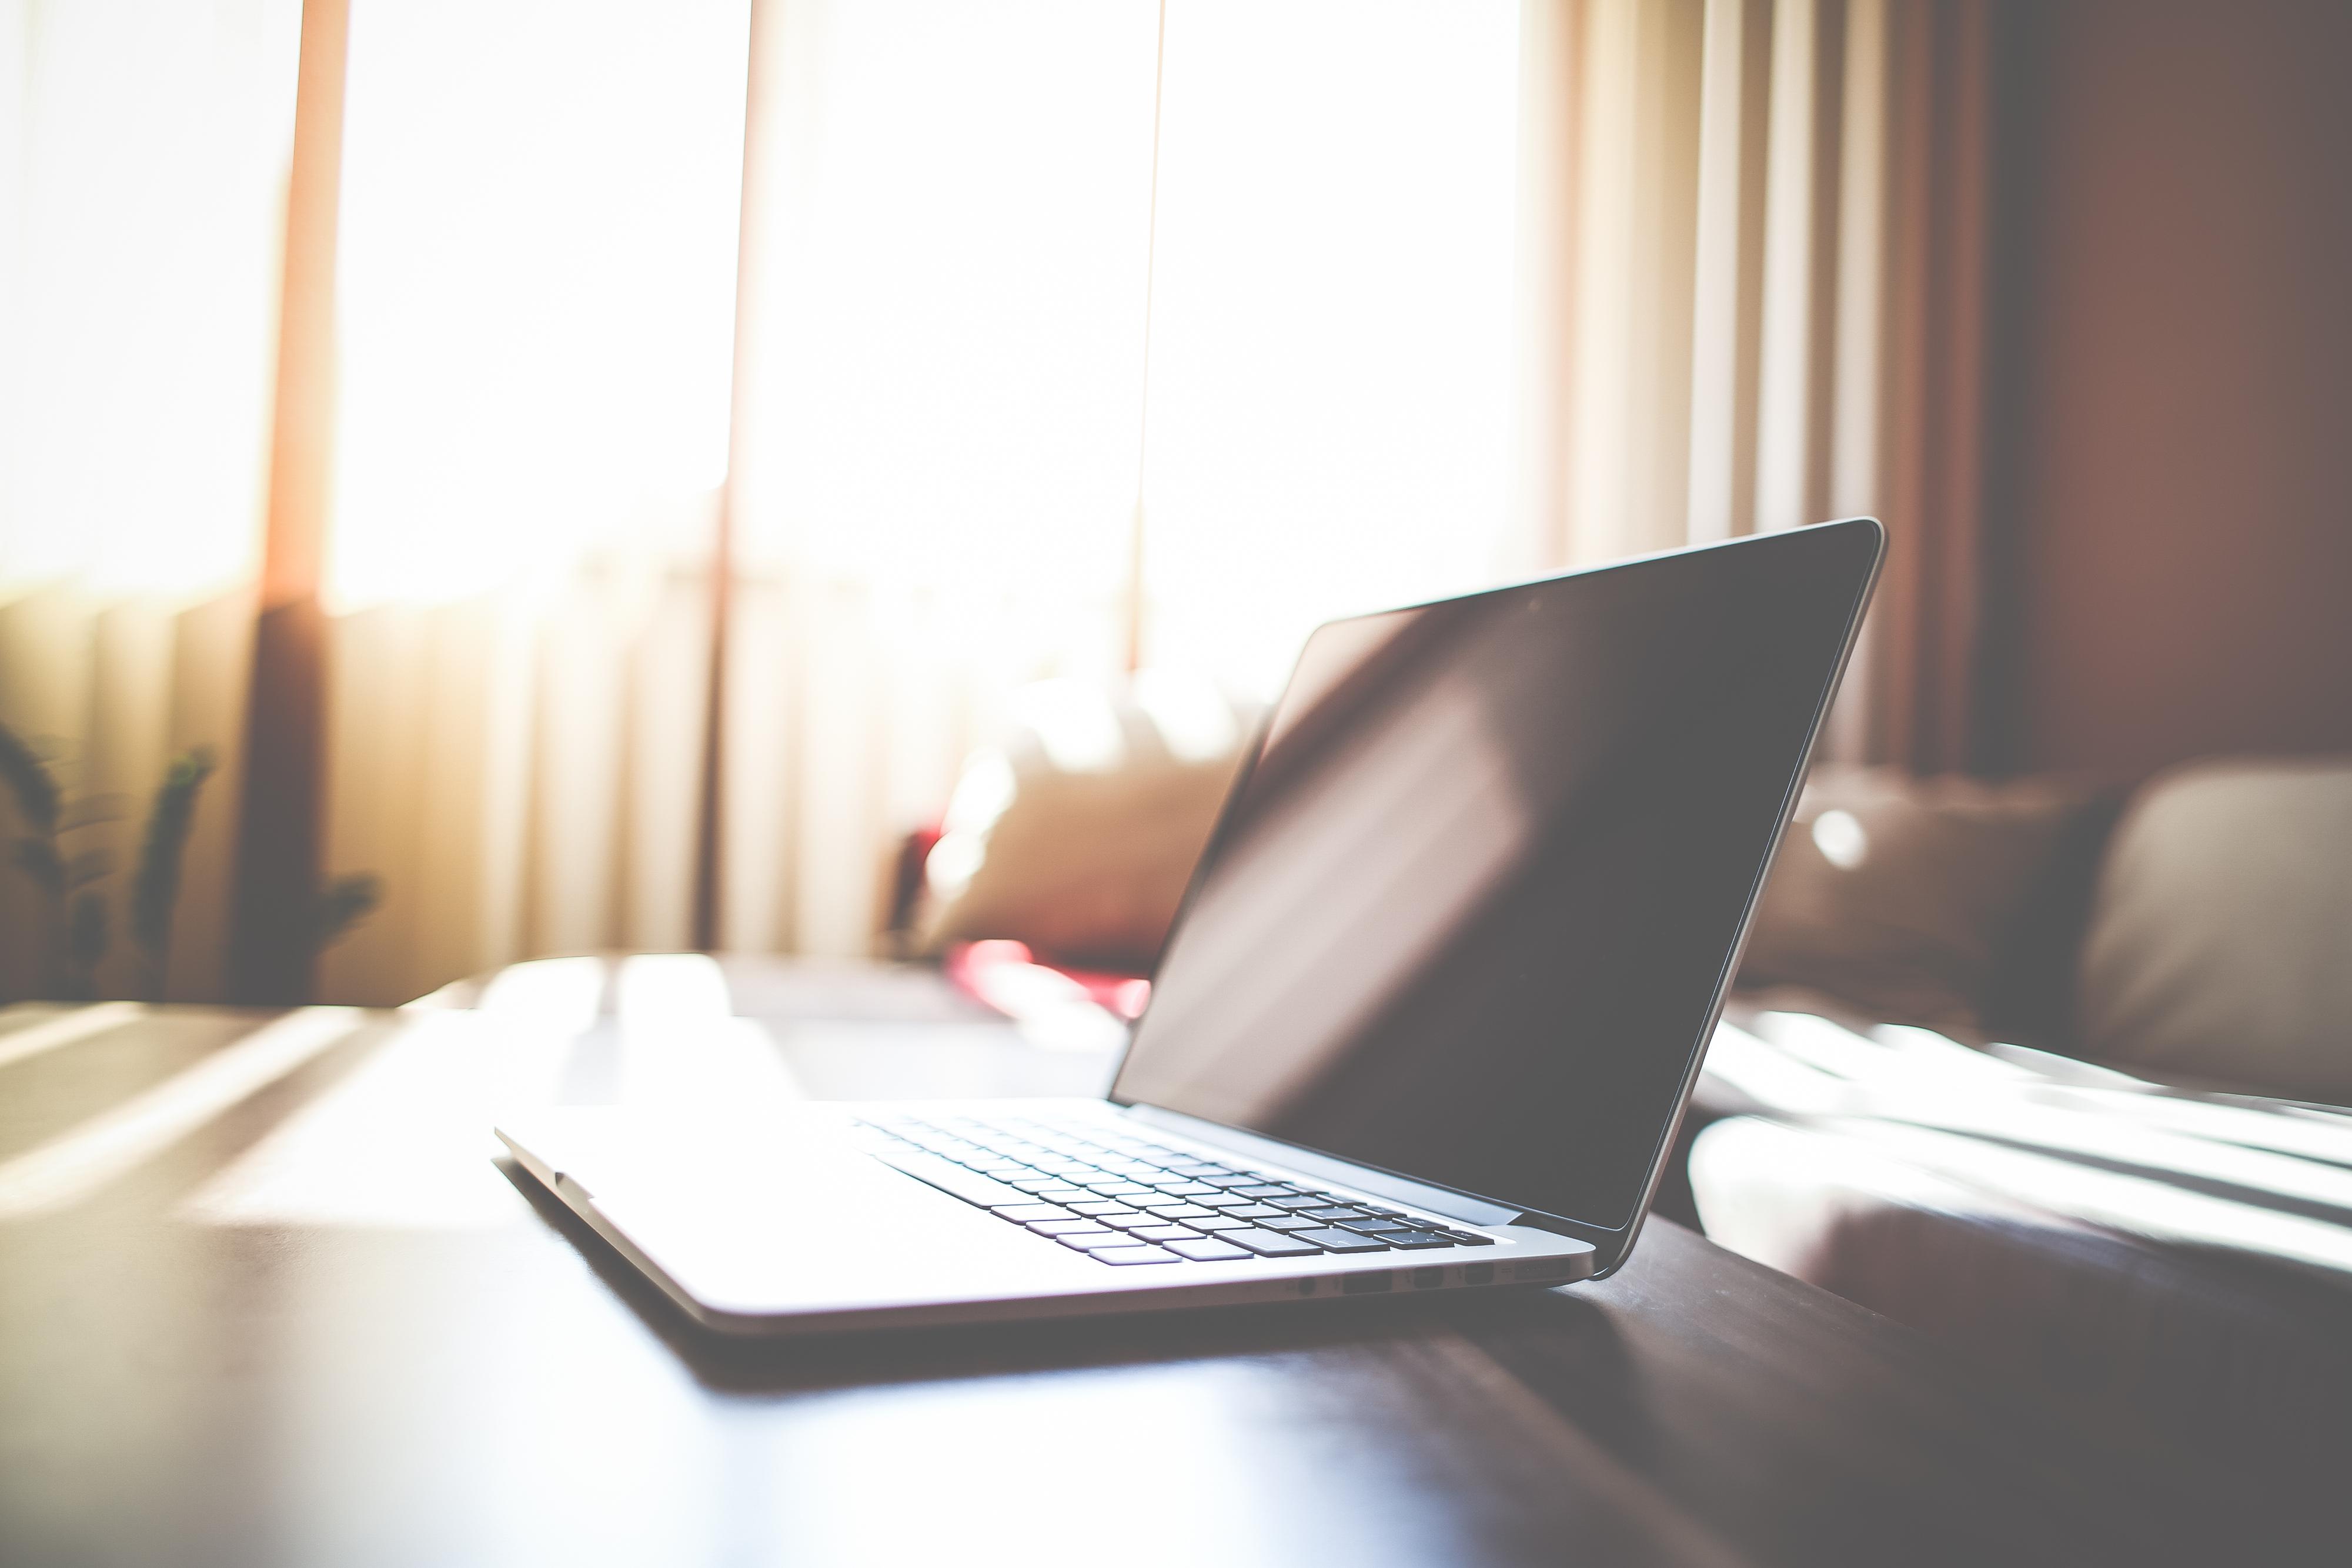 macbook-on-living-room-table-picjumbo-com